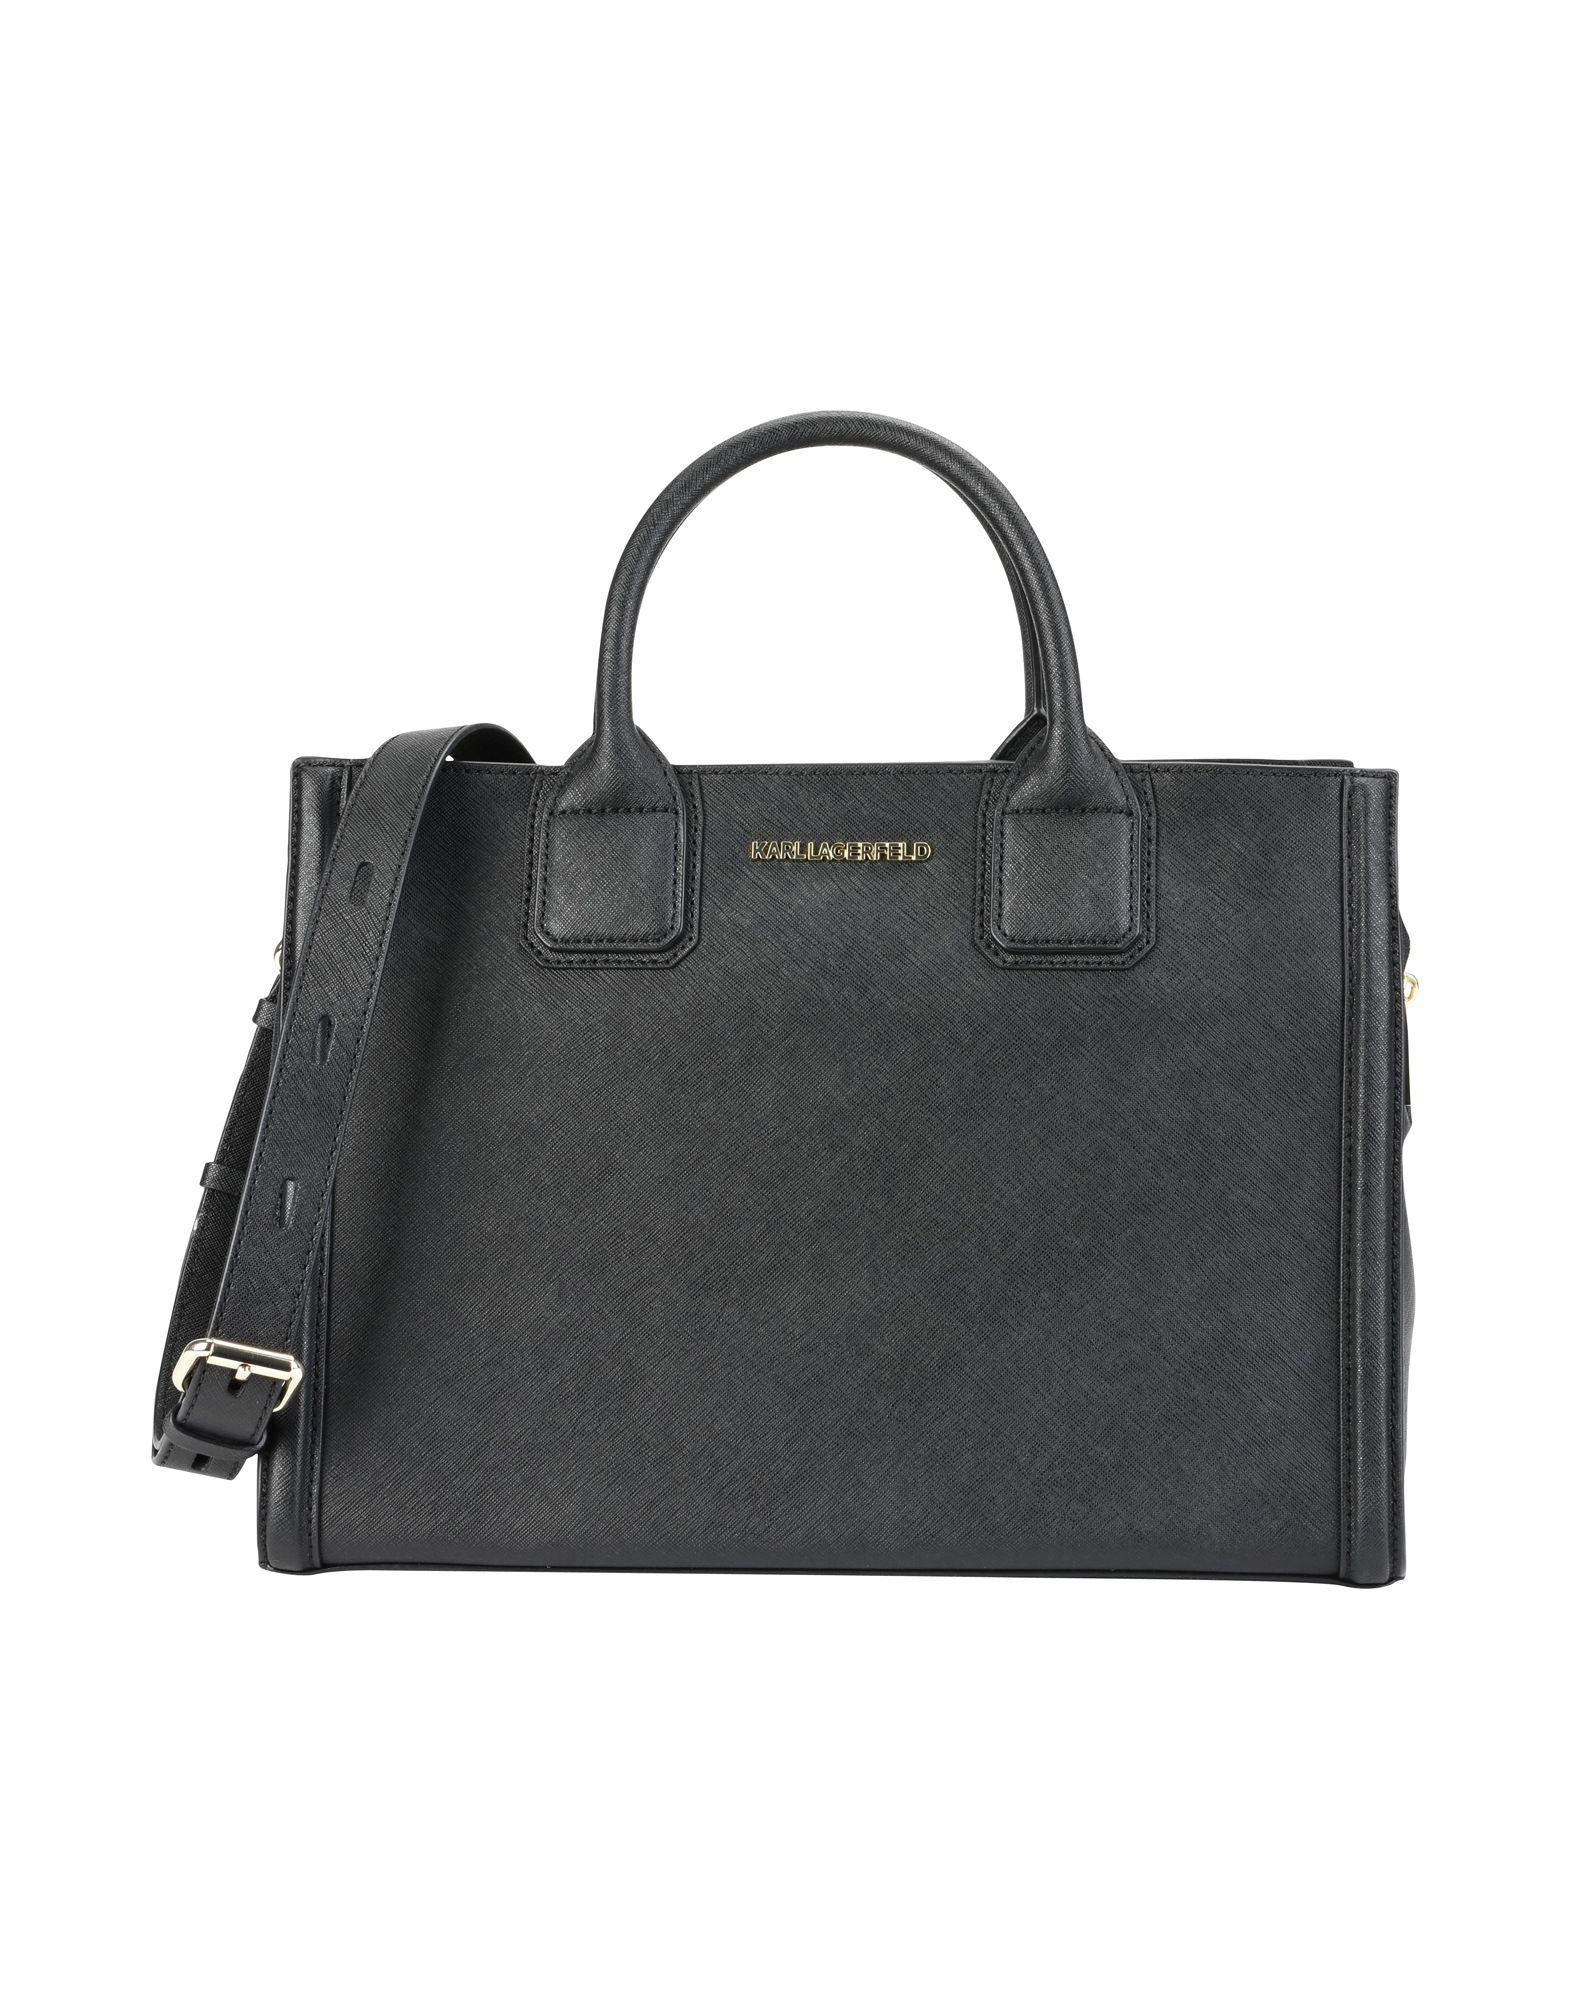 Borsa A Mano Karl Lagerfeld Donna - Acquista online su